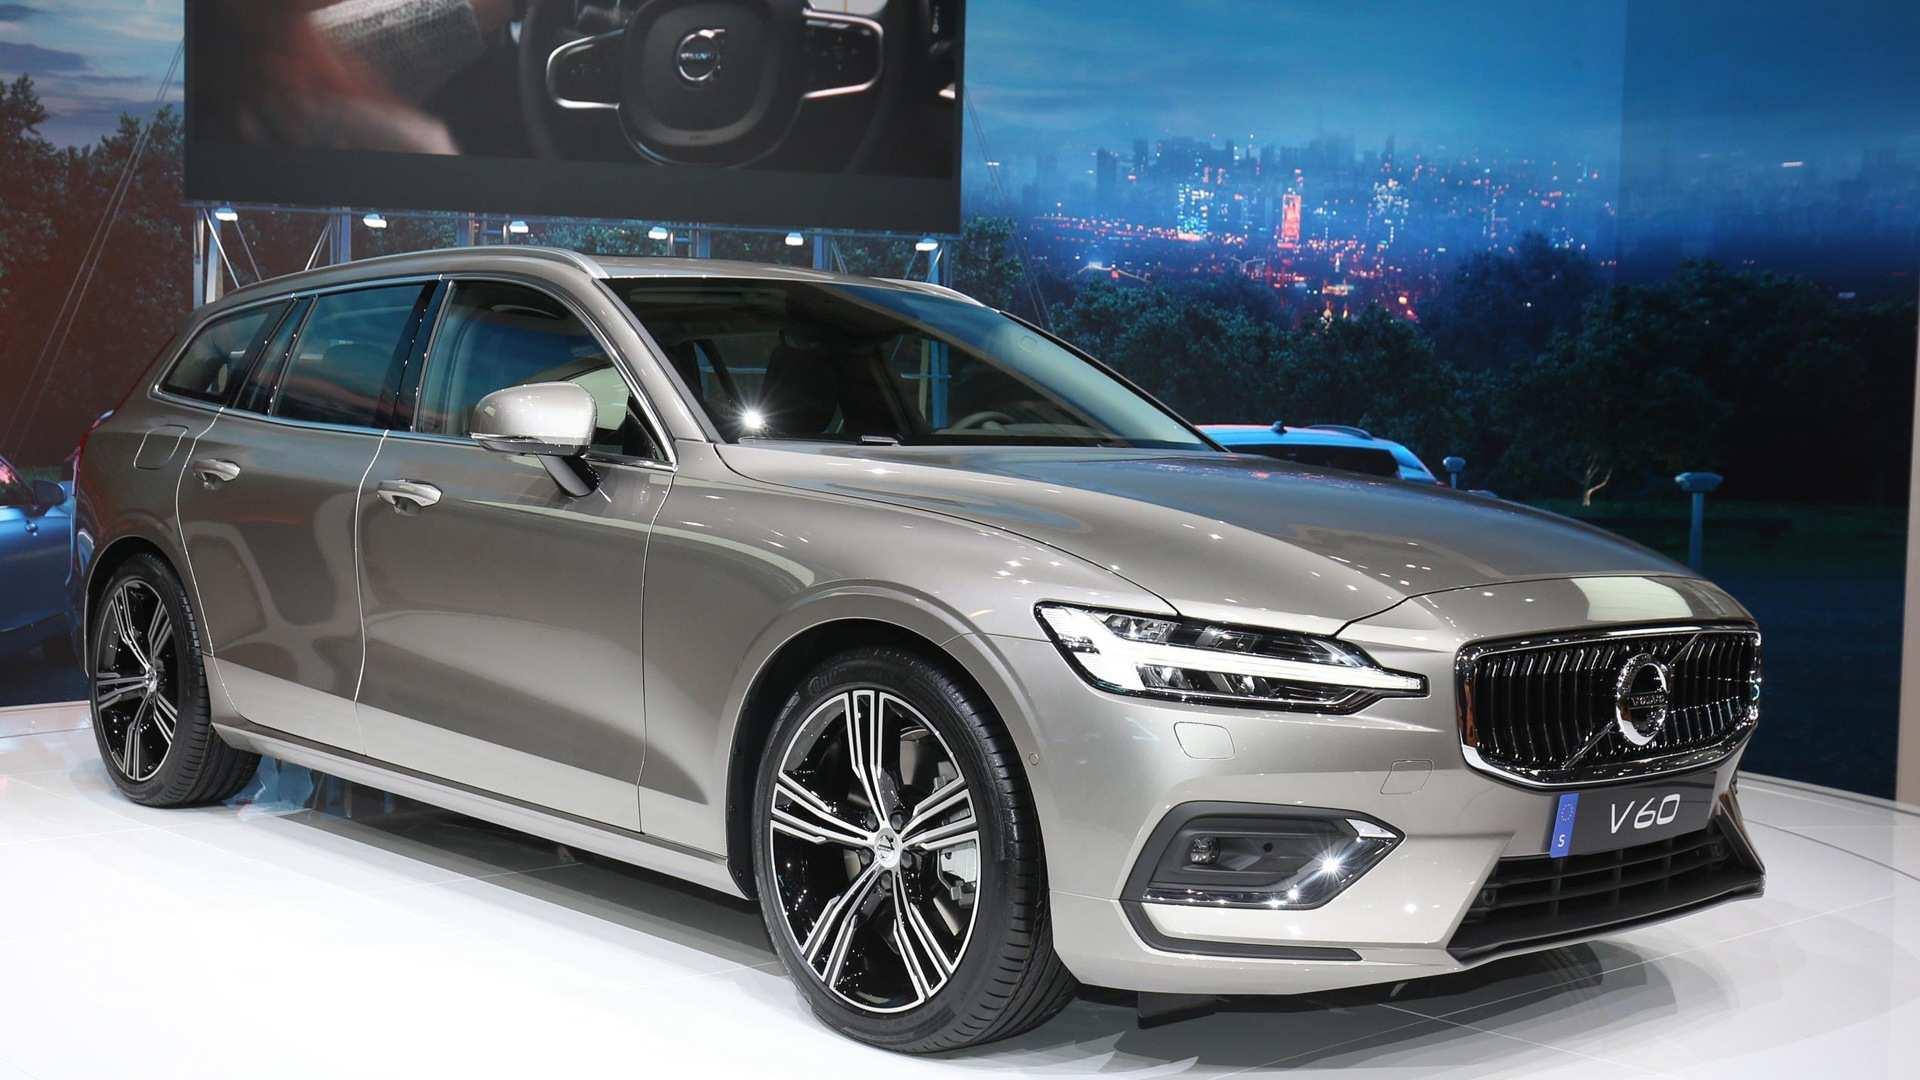 61 Concept of Volvo Modellar 2019 Rumor Specs and Review for Volvo Modellar 2019 Rumor